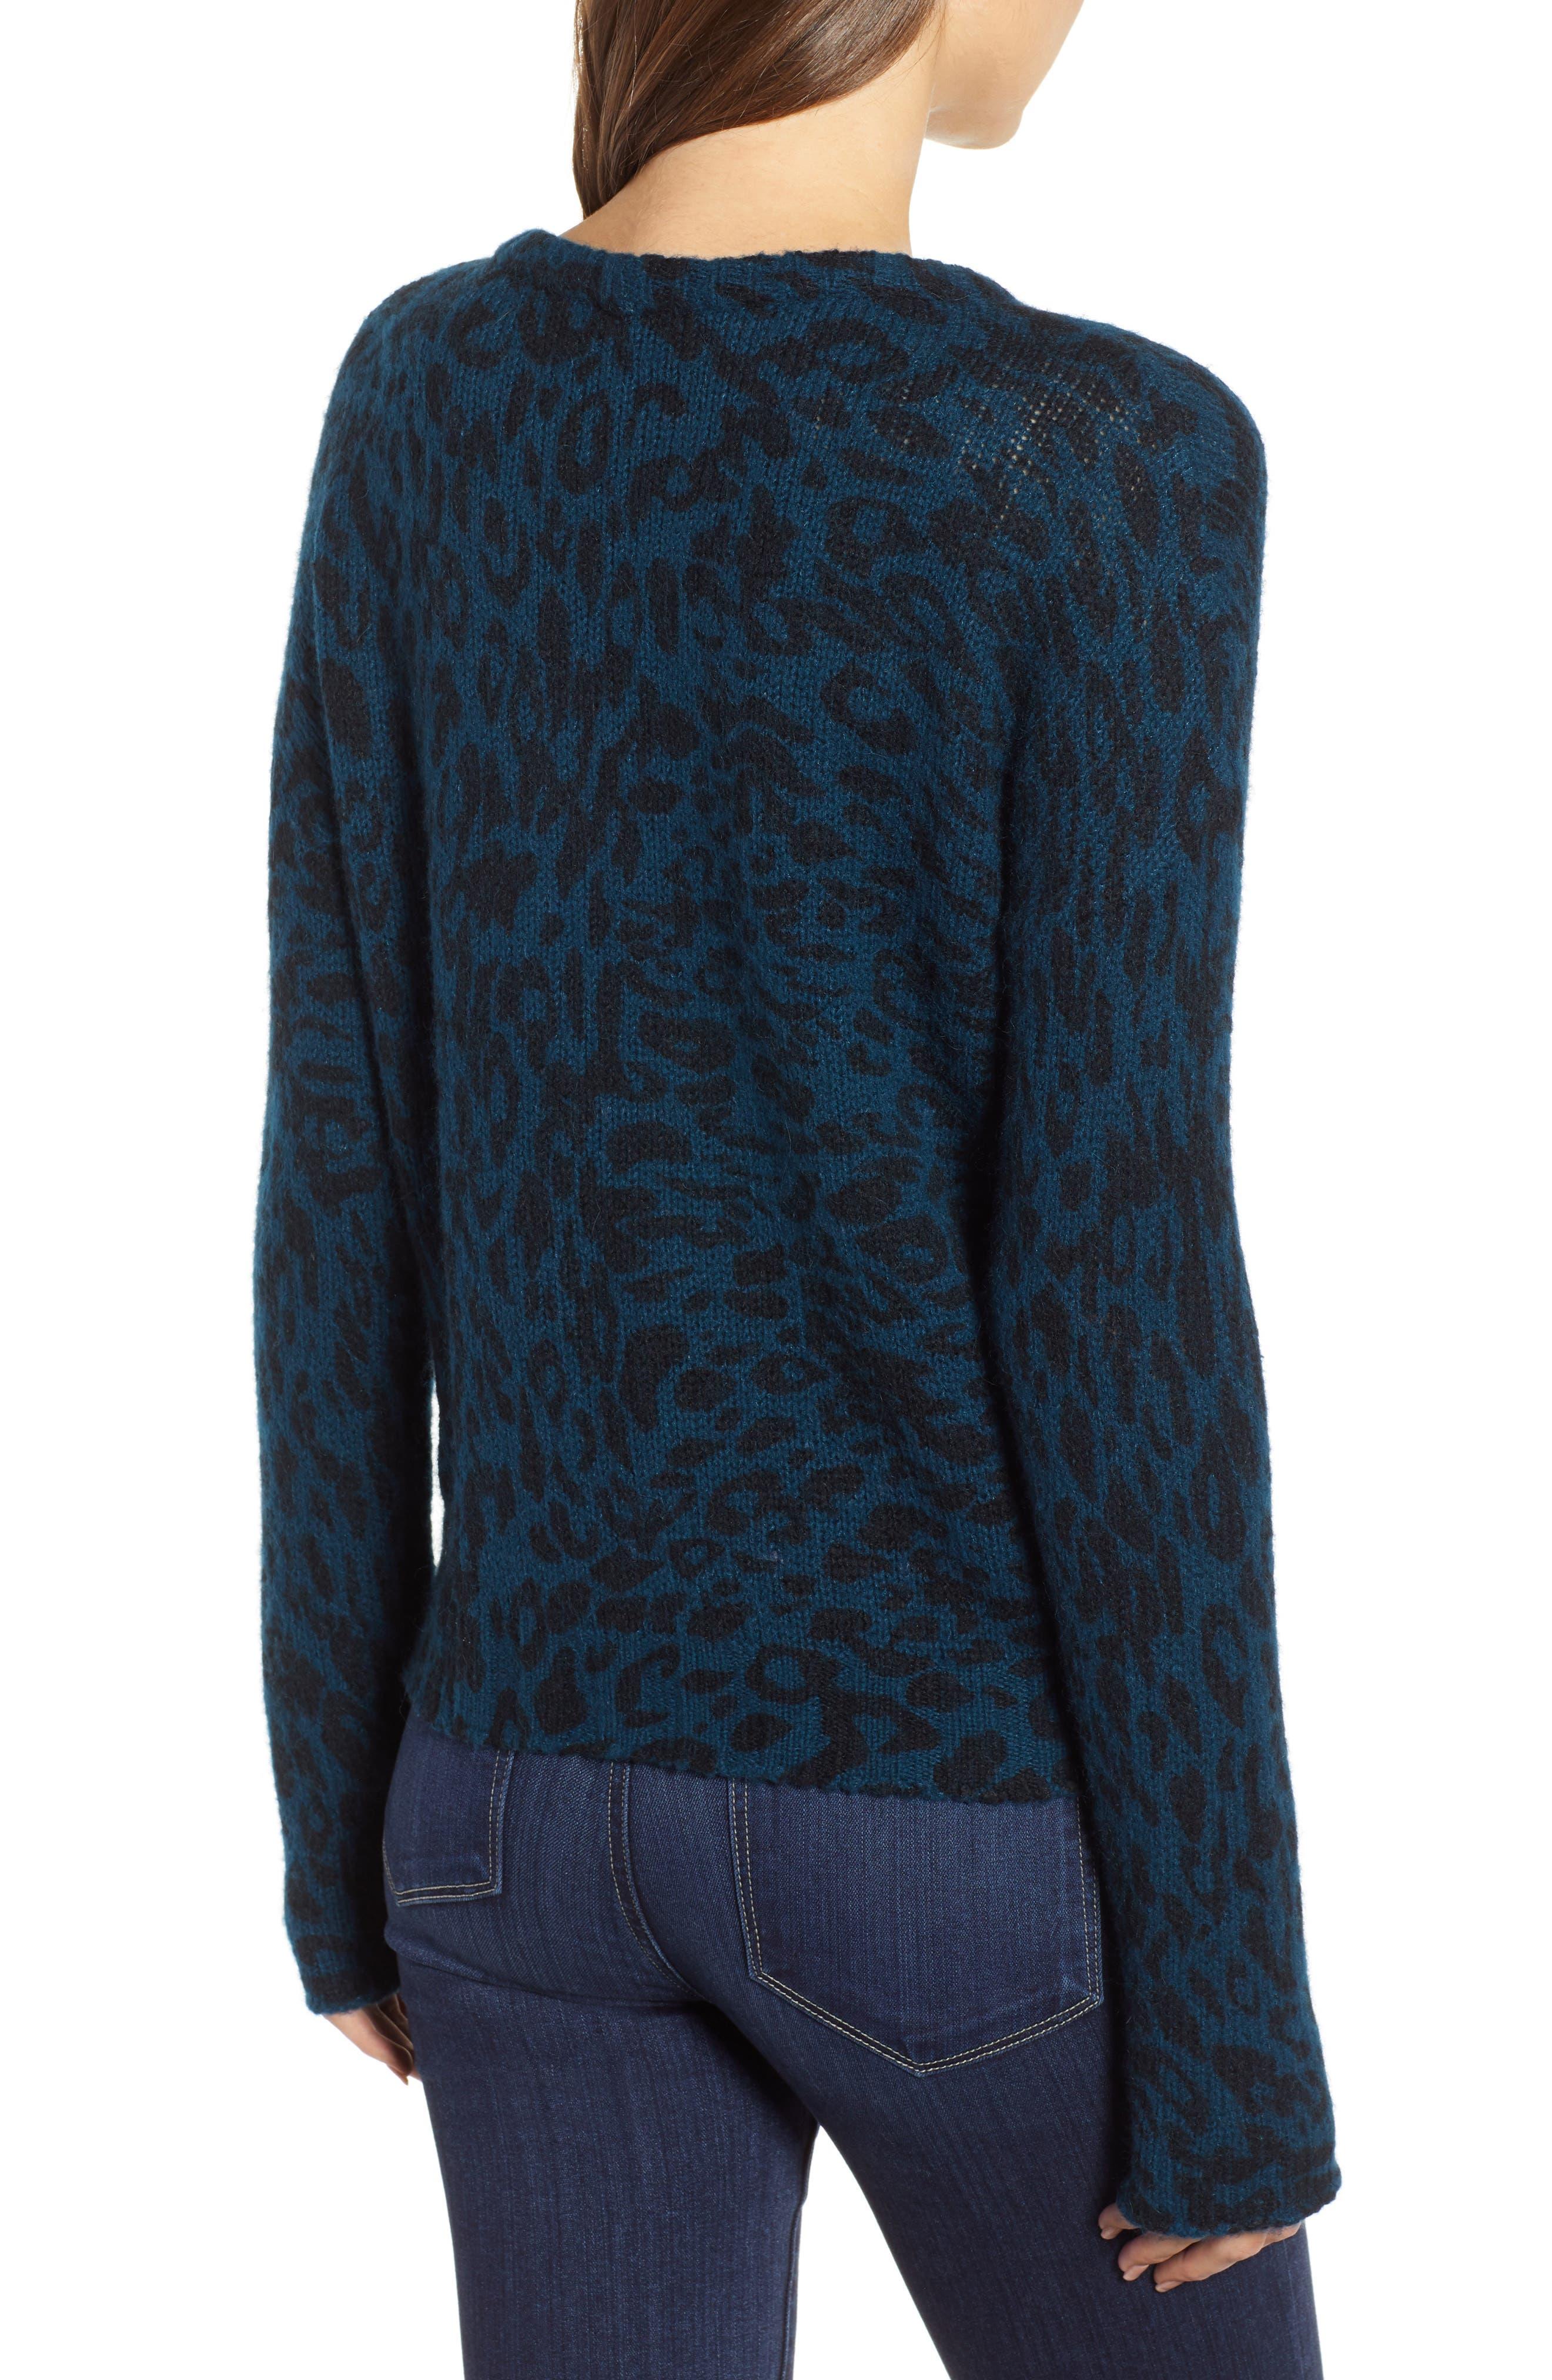 Donovan Animal Print Sweater,                             Alternate thumbnail 2, color,                             BLUE LEOPARD